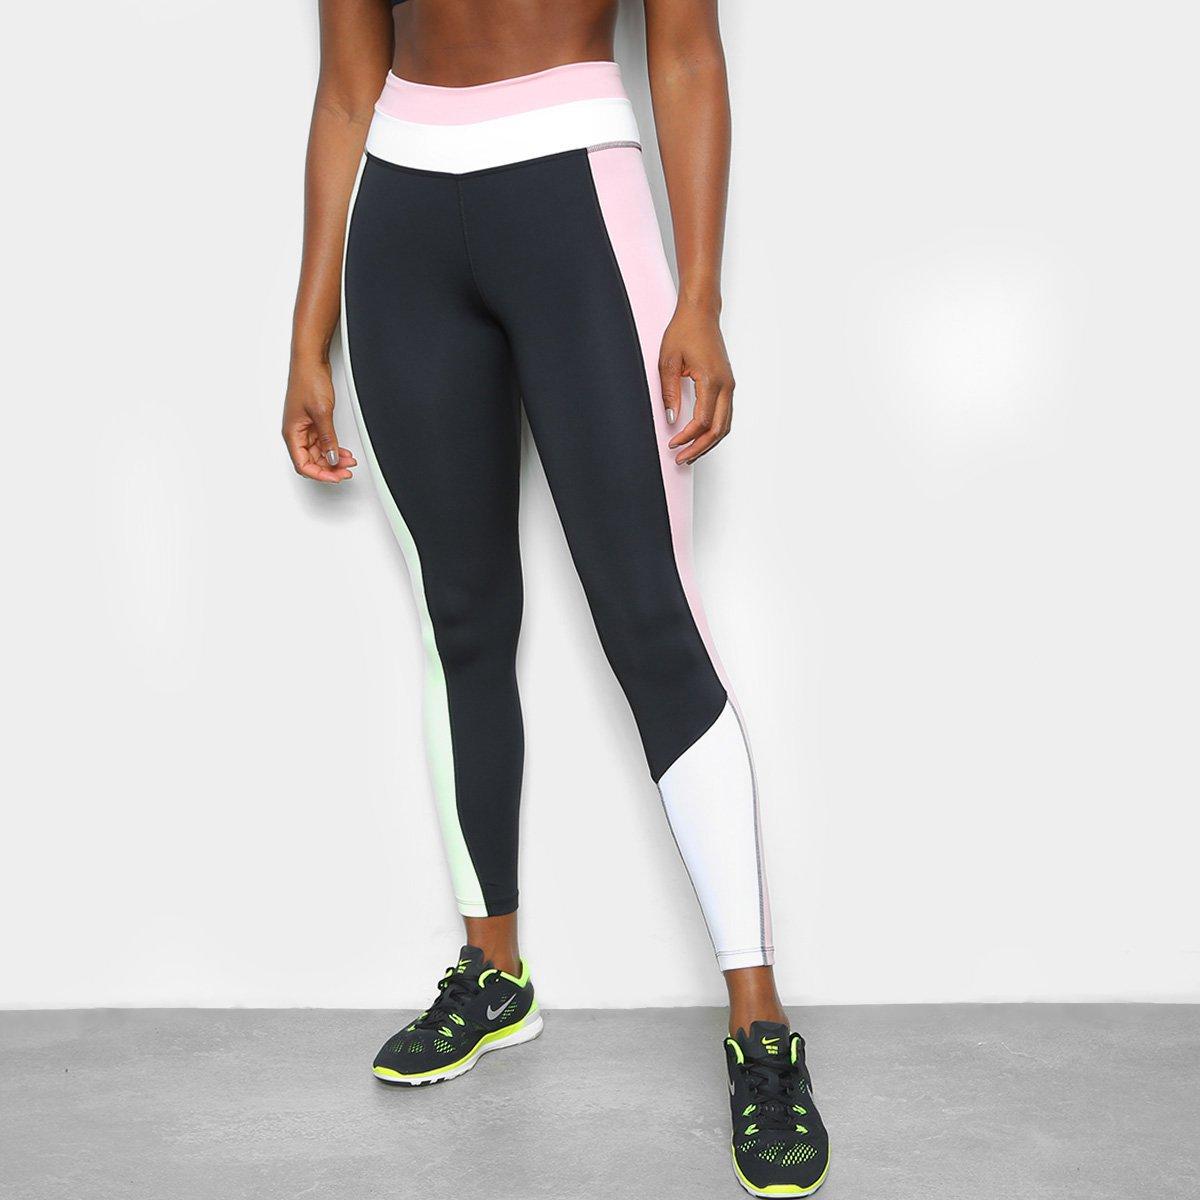 Calça Legging Nike One Colorblok Cintura Alta Feminina